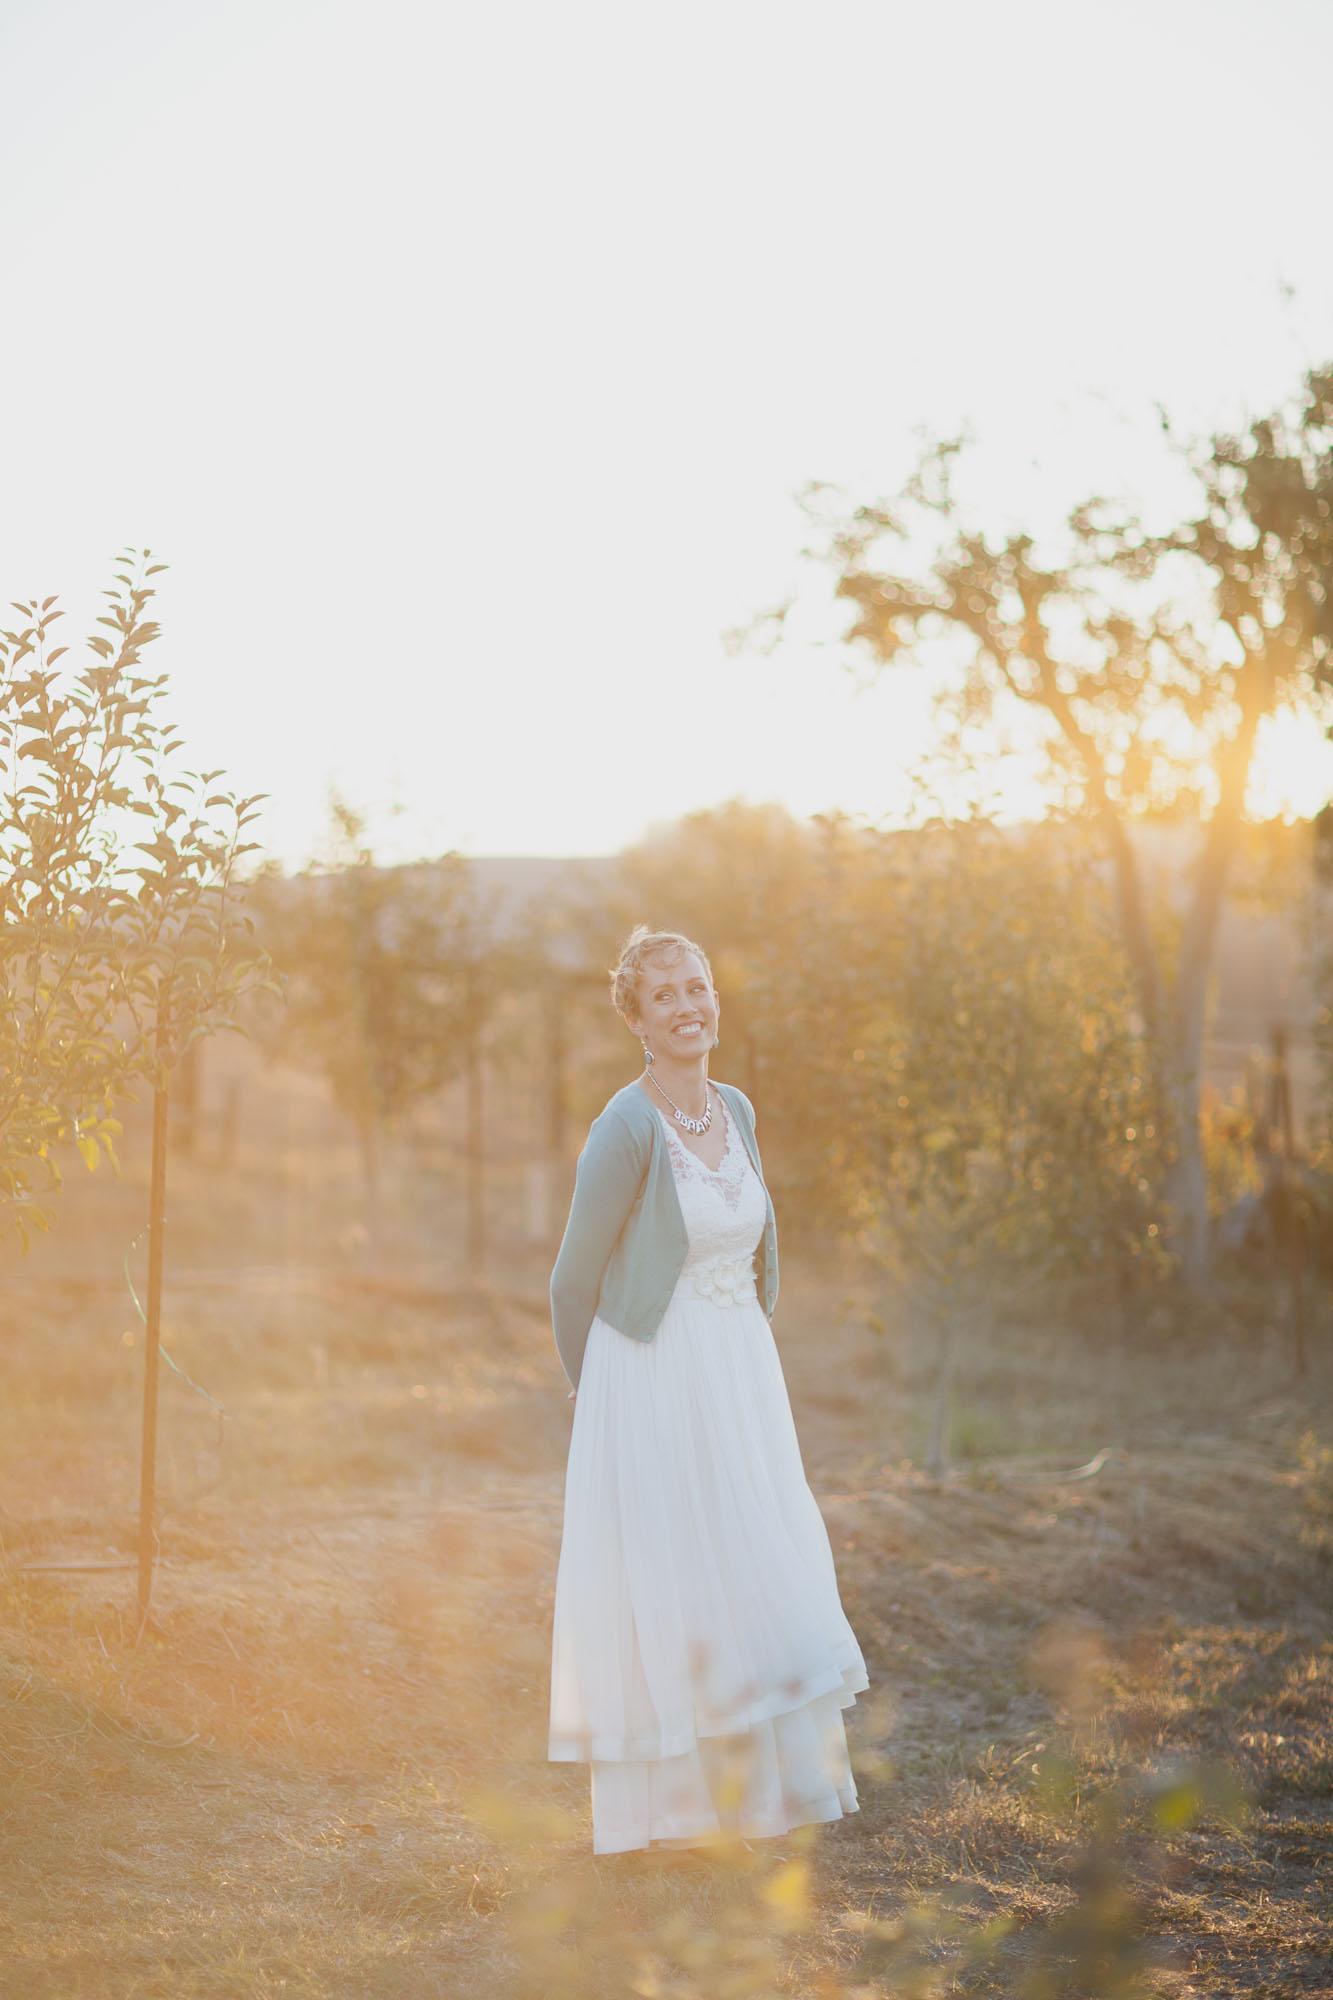 Gretchen_Gause_Petaluma_Olympias_Valley_Wedding_Photo-198.jpg